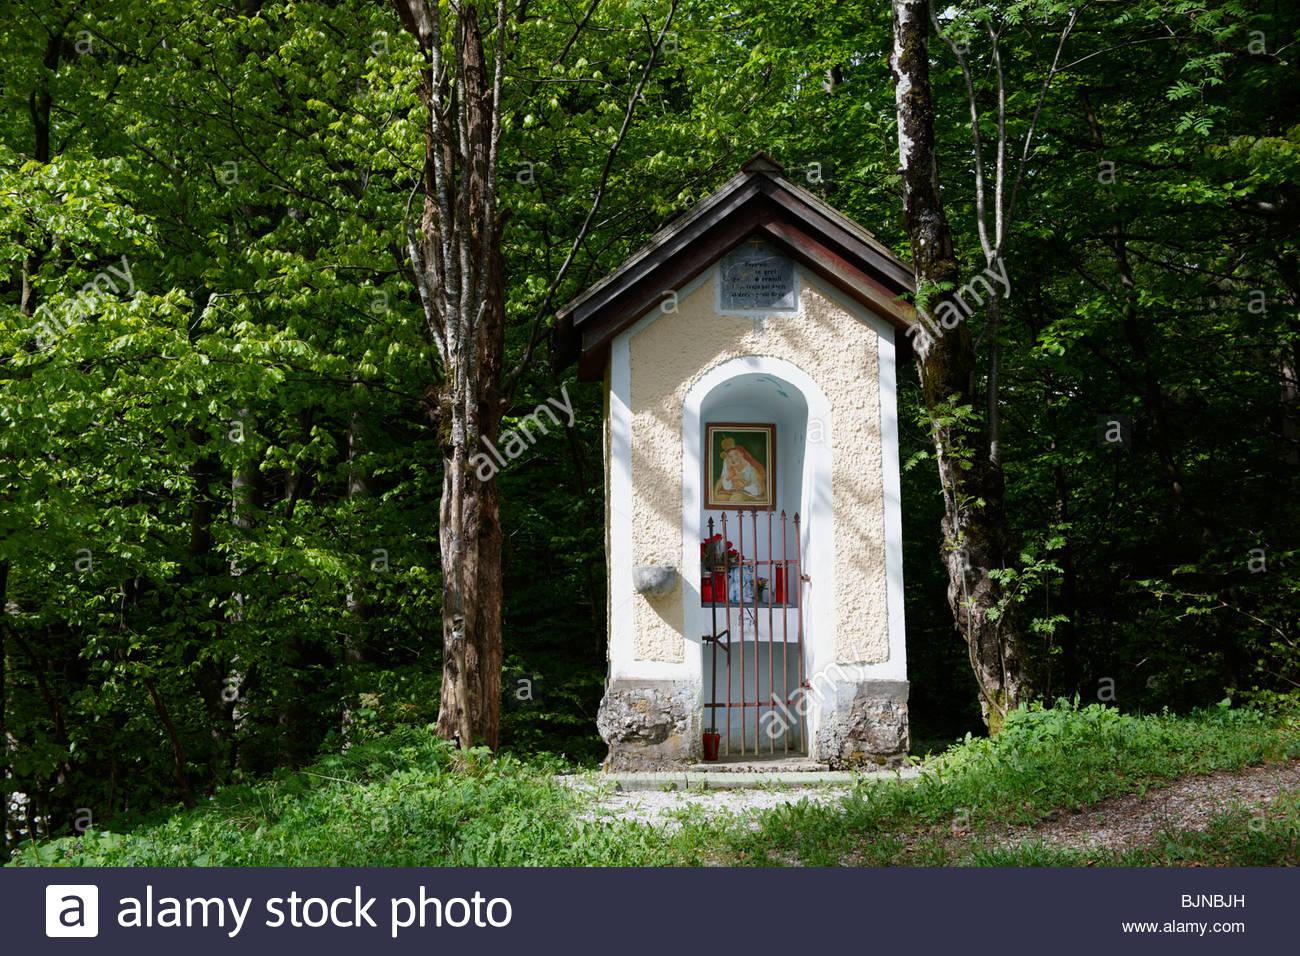 Santuario Religioso cerca del lago Bled Eslovenia. Imagen De Stock